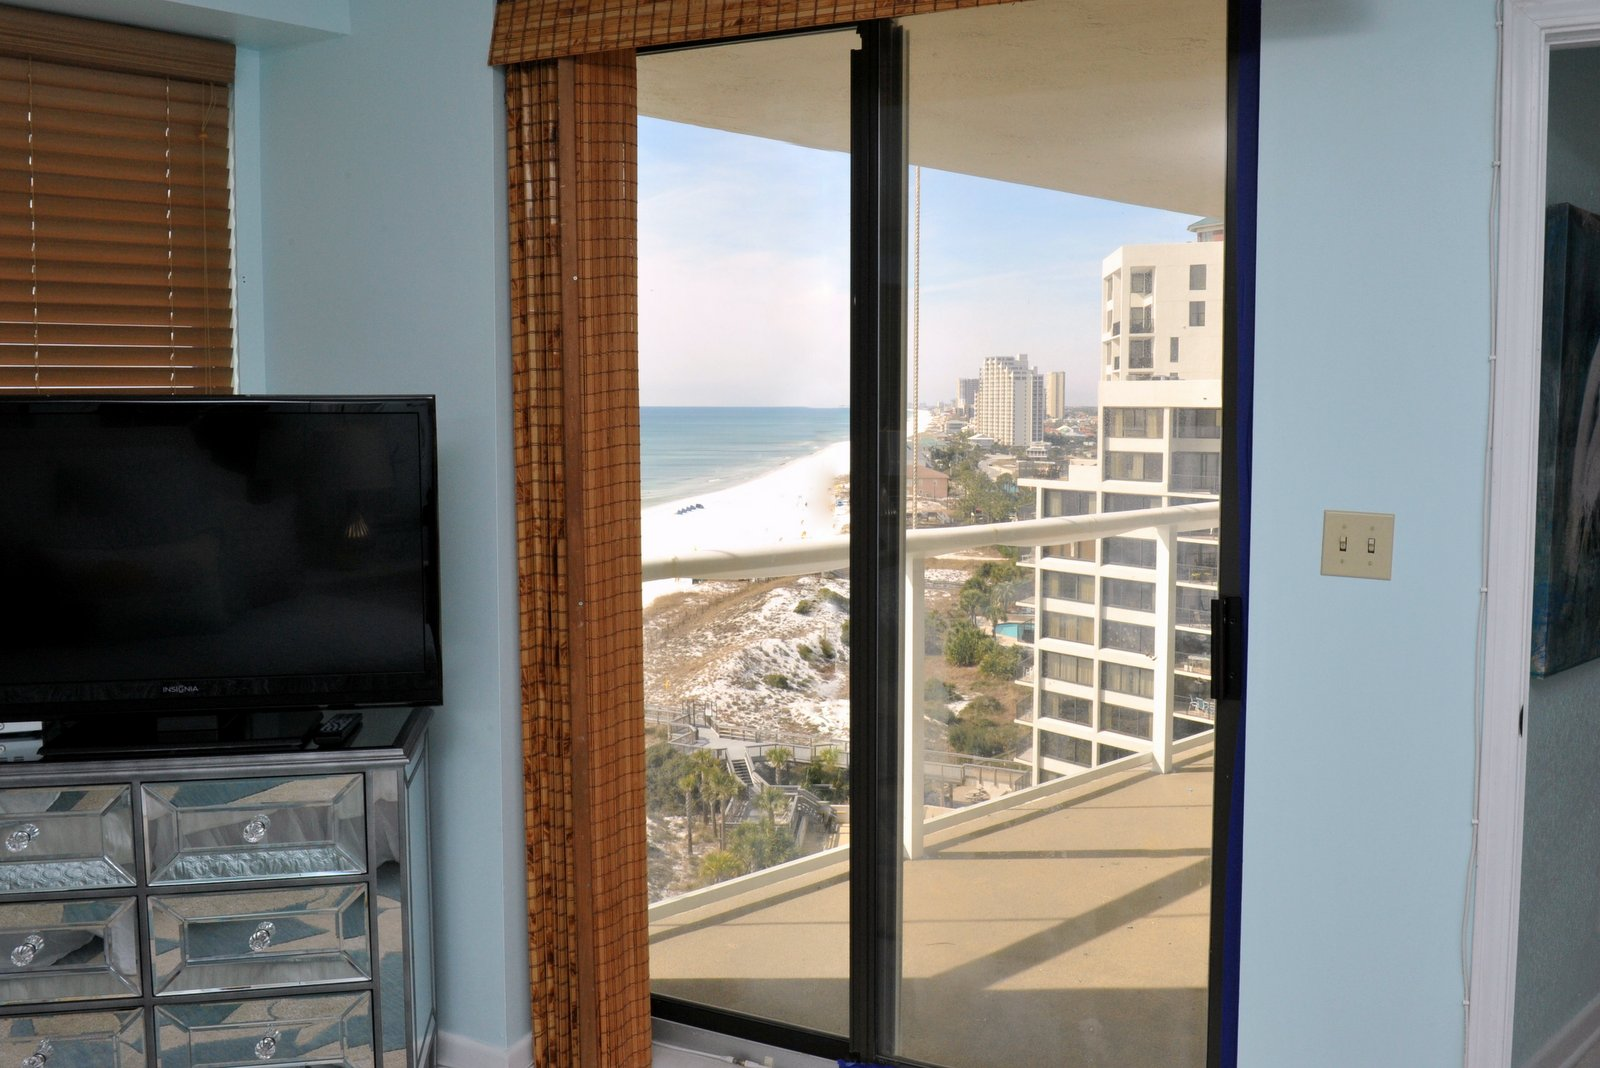 4321 Beachside Two Condo rental in Beachside Towers at Sandestin in Destin Florida - #12